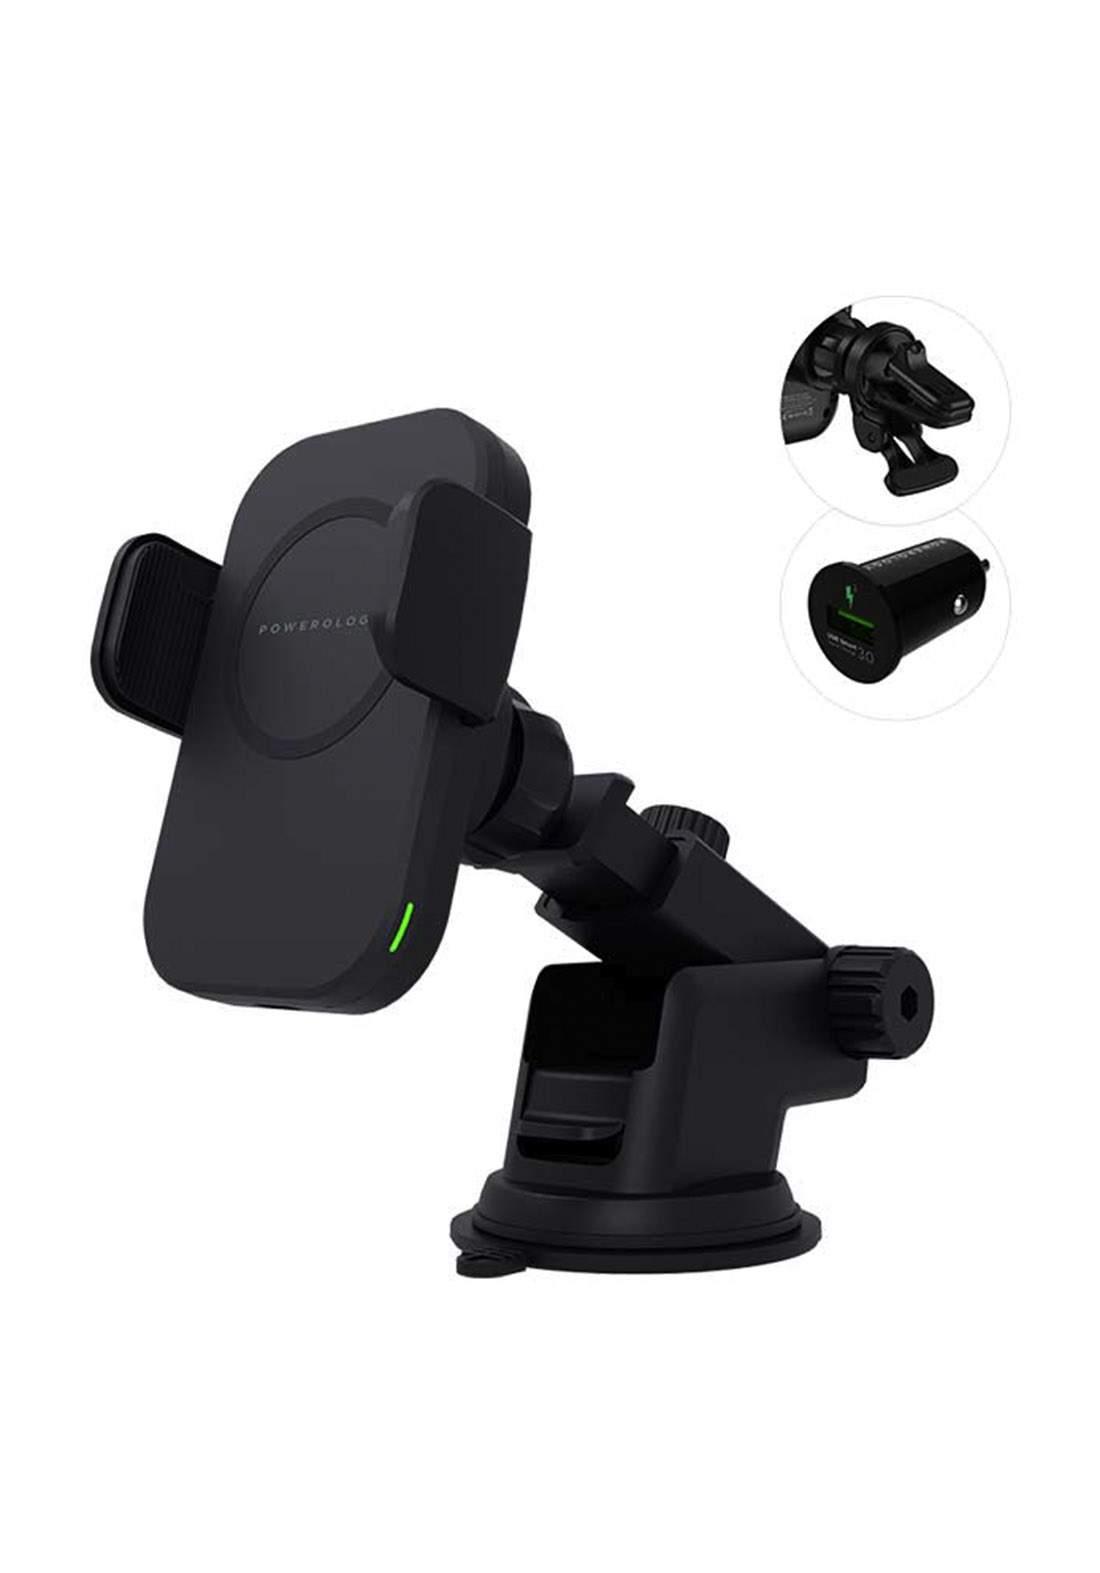 Powerology 15W Fast Wireless Magsafe Mount - Black